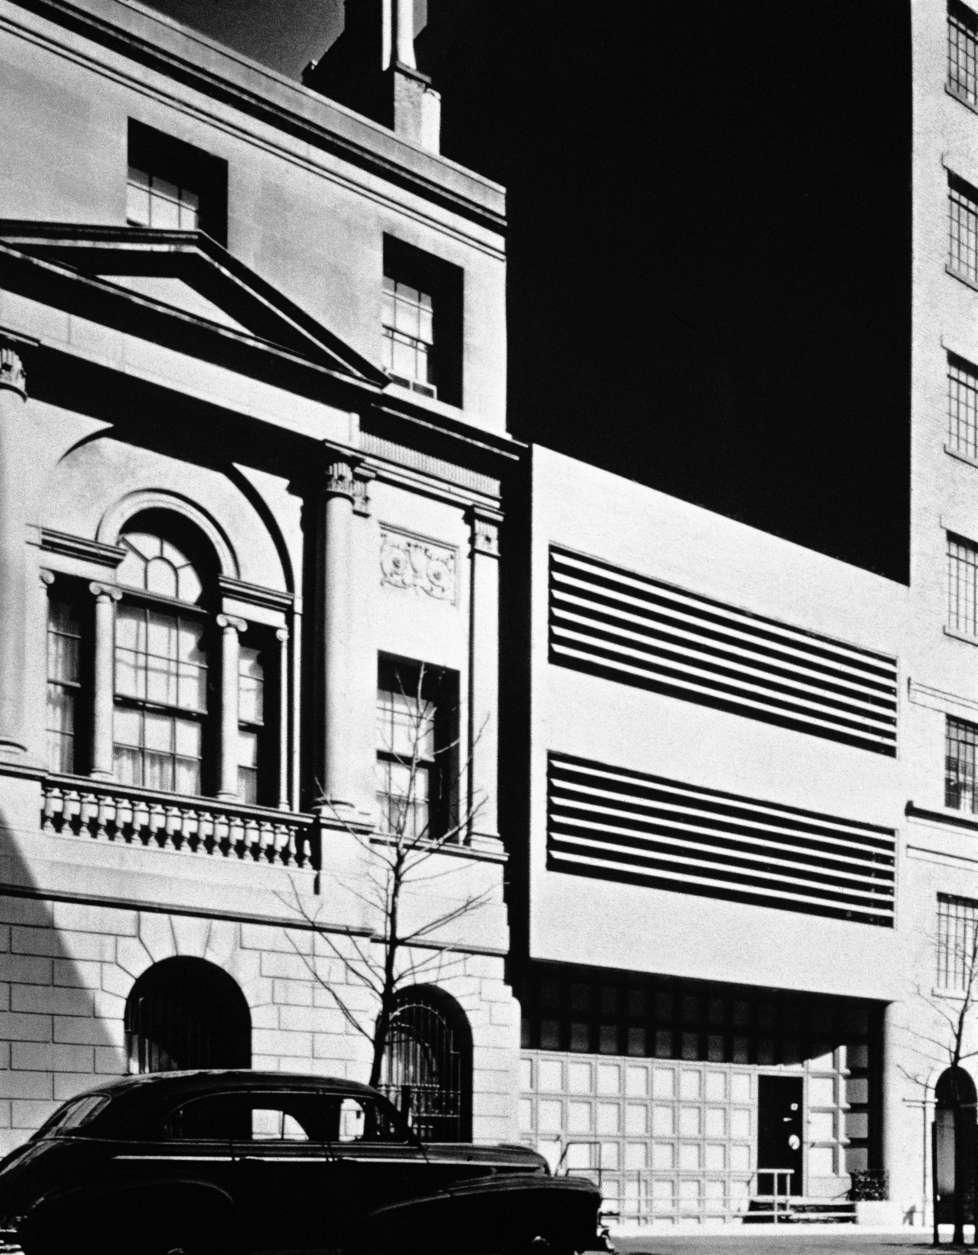 sherman fairchild house new york city new york